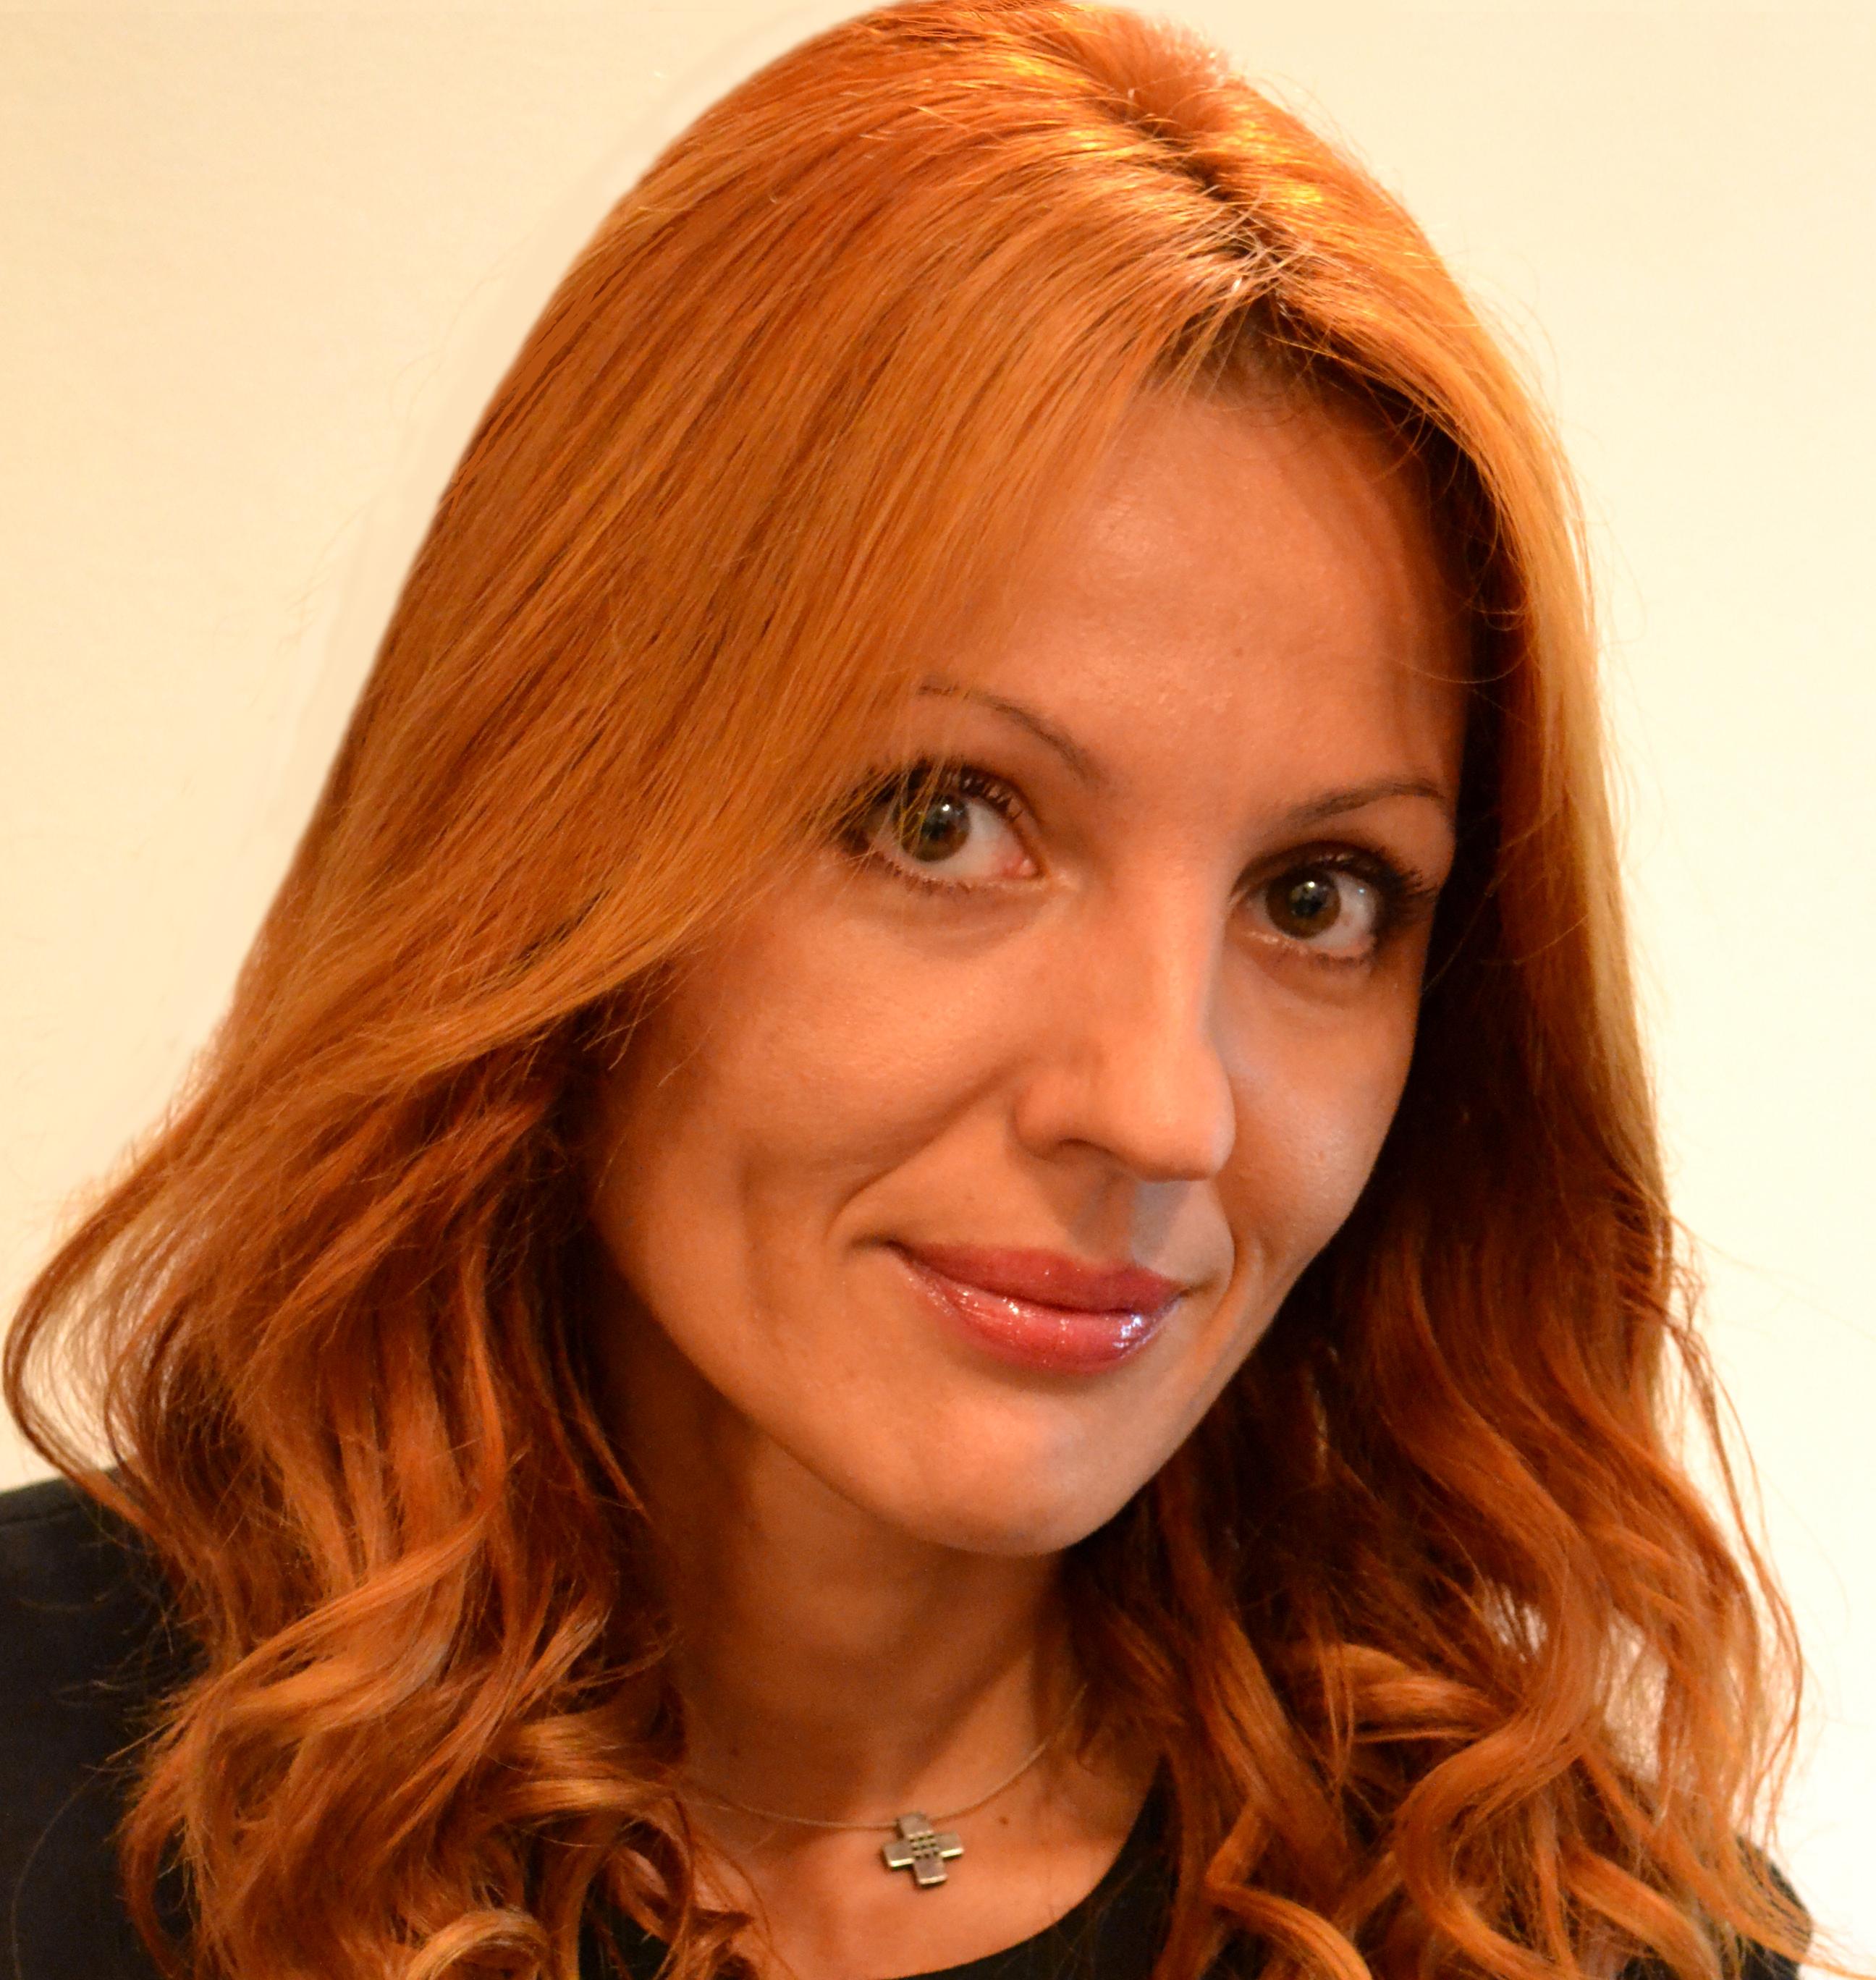 Tatjana Sibalija